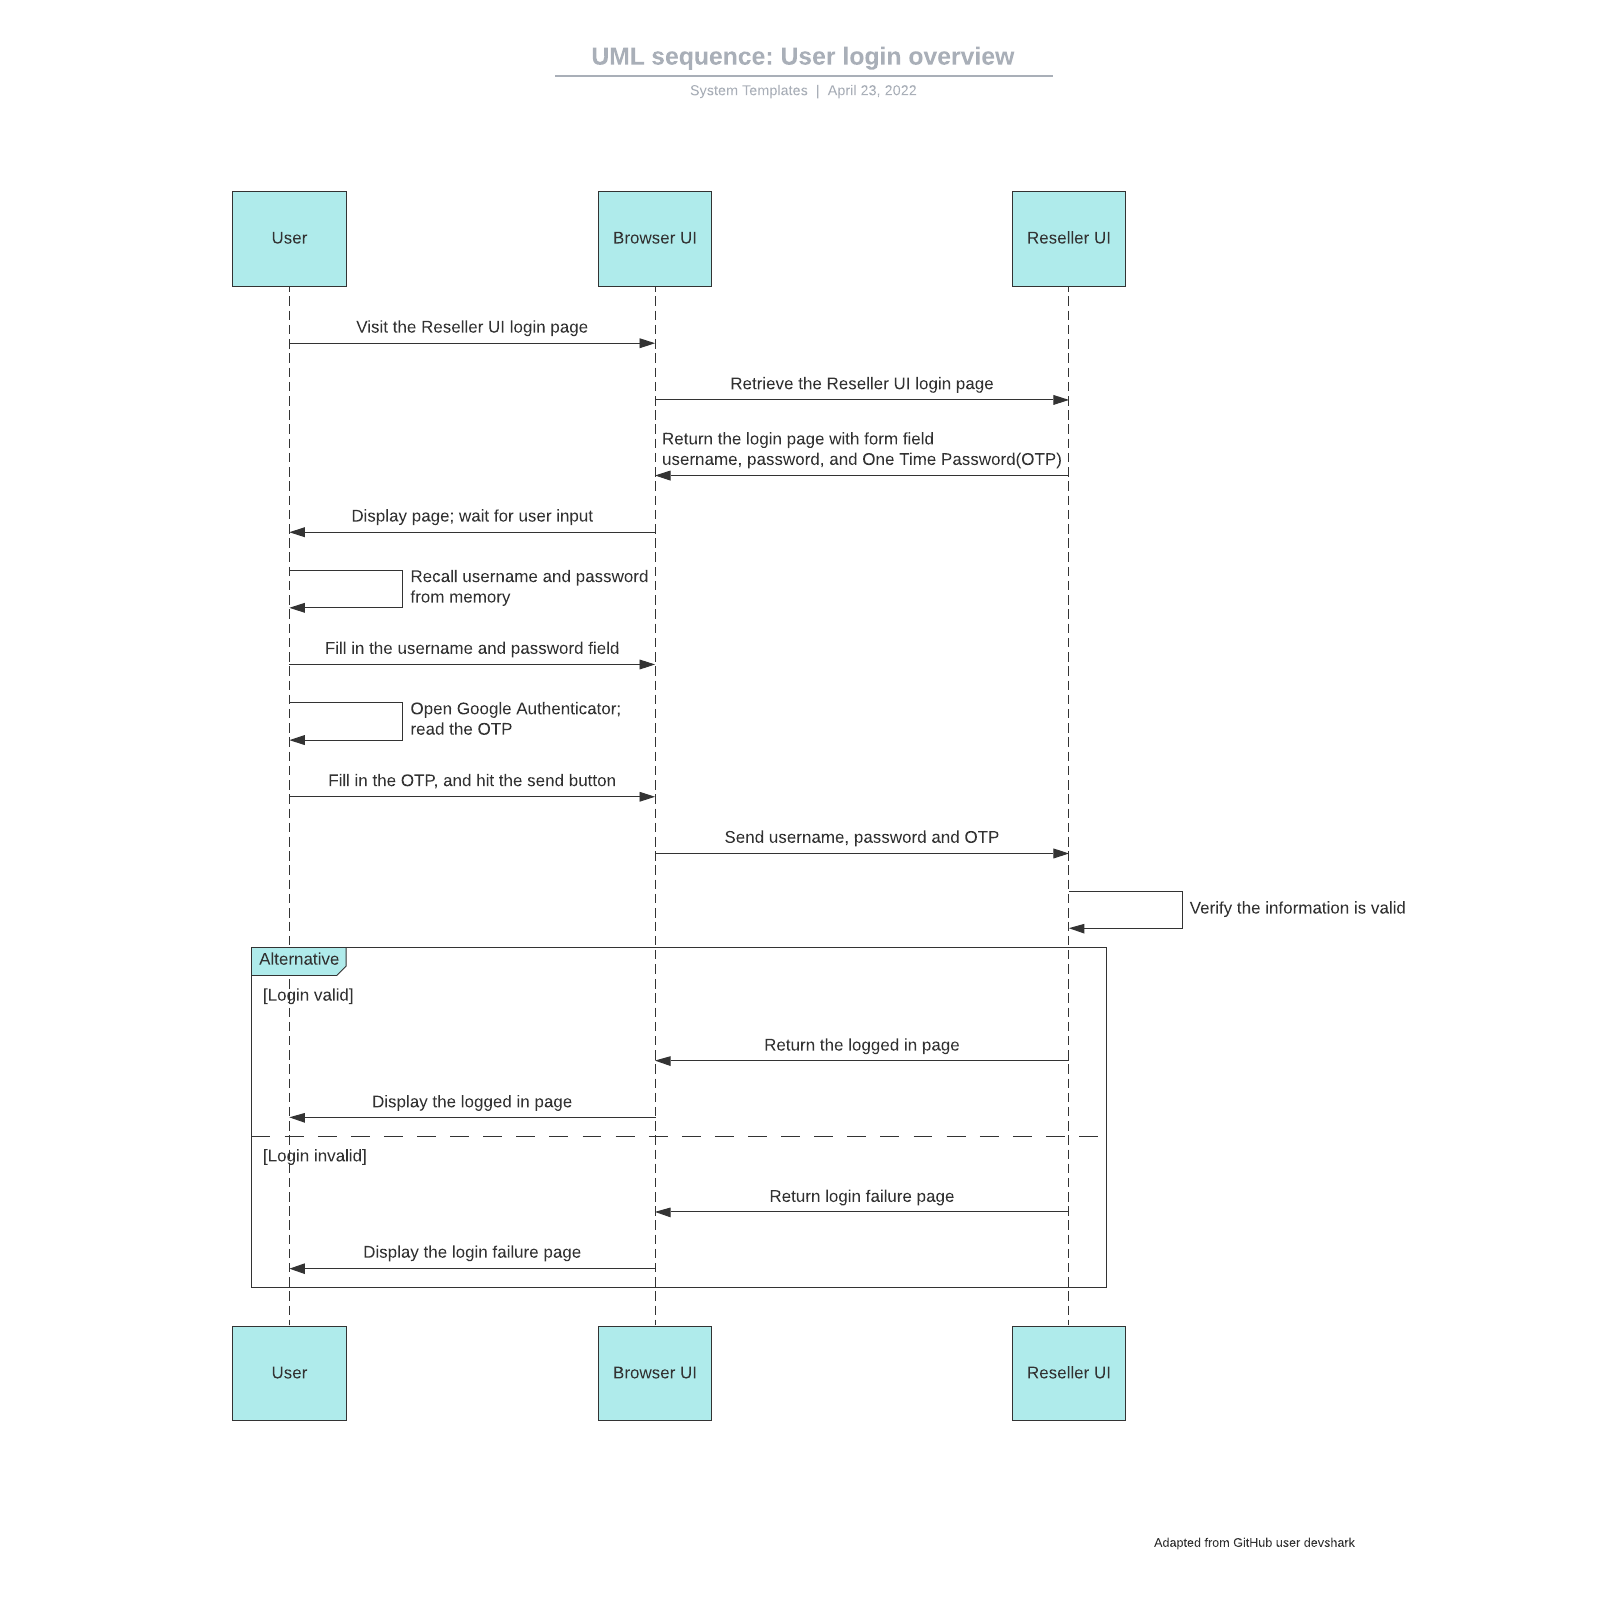 UML sequence: User login overview